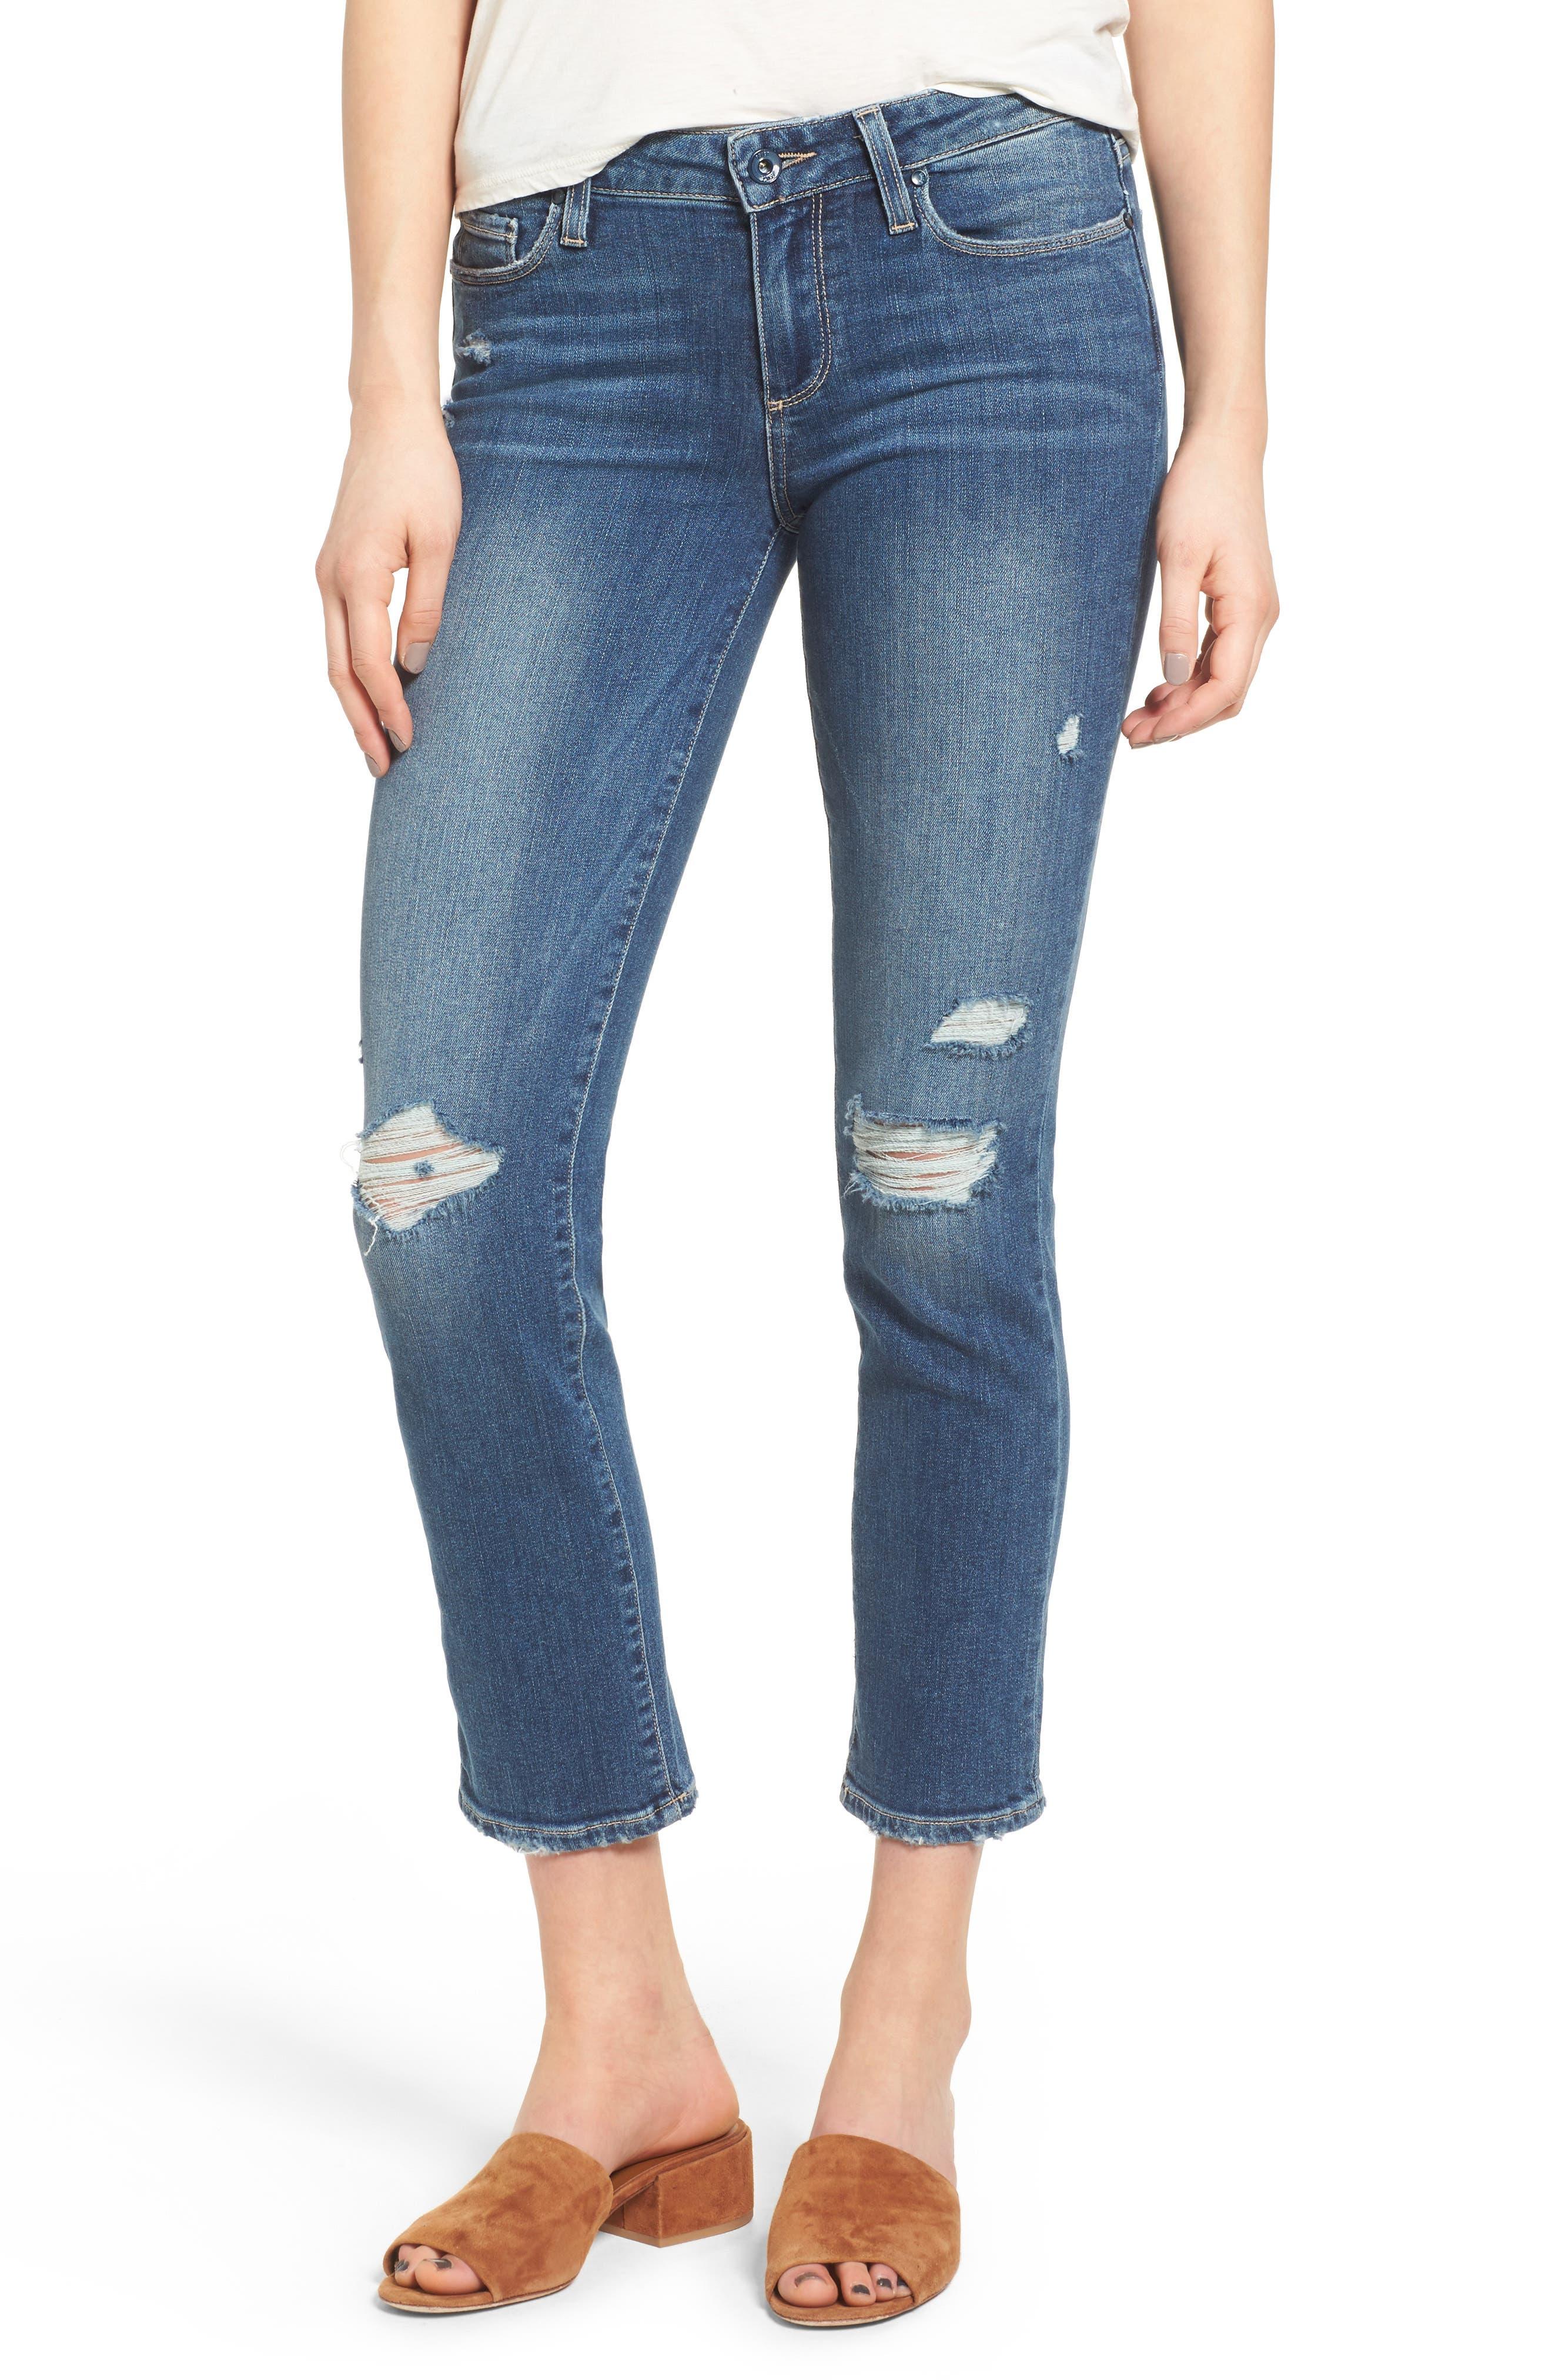 Alternate Image 1 Selected - PAIGE Miki Crop Straight Leg Jeans (Destructed Blue)